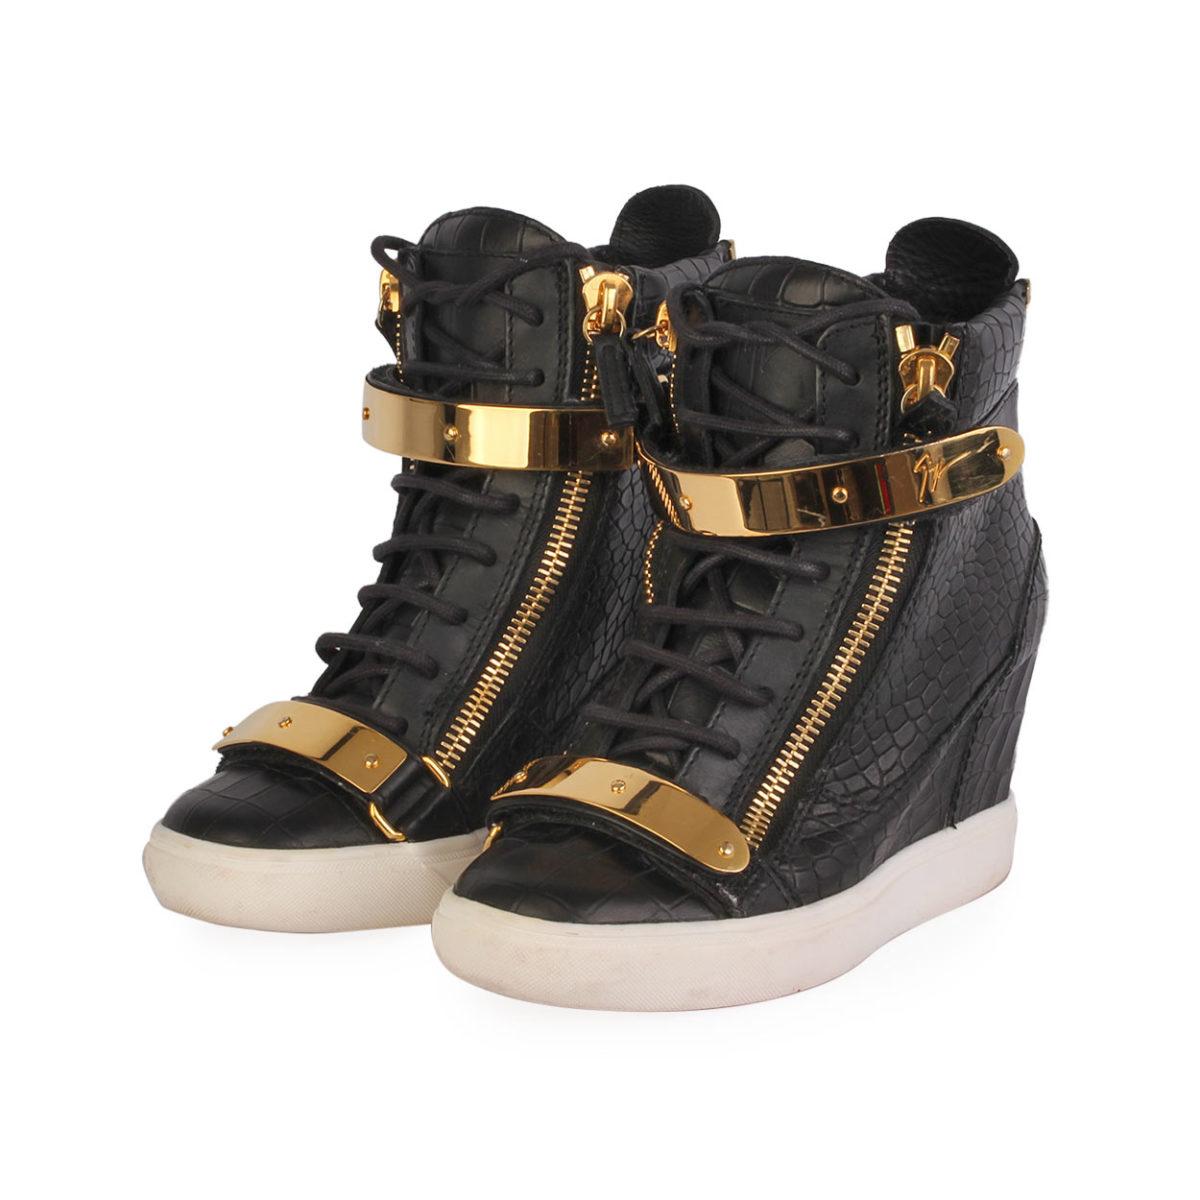 fbe42edad1c3 GIUSEPPE ZANOTTI Leather High Top Wedge Sneakers Black - S  37 (4 ...